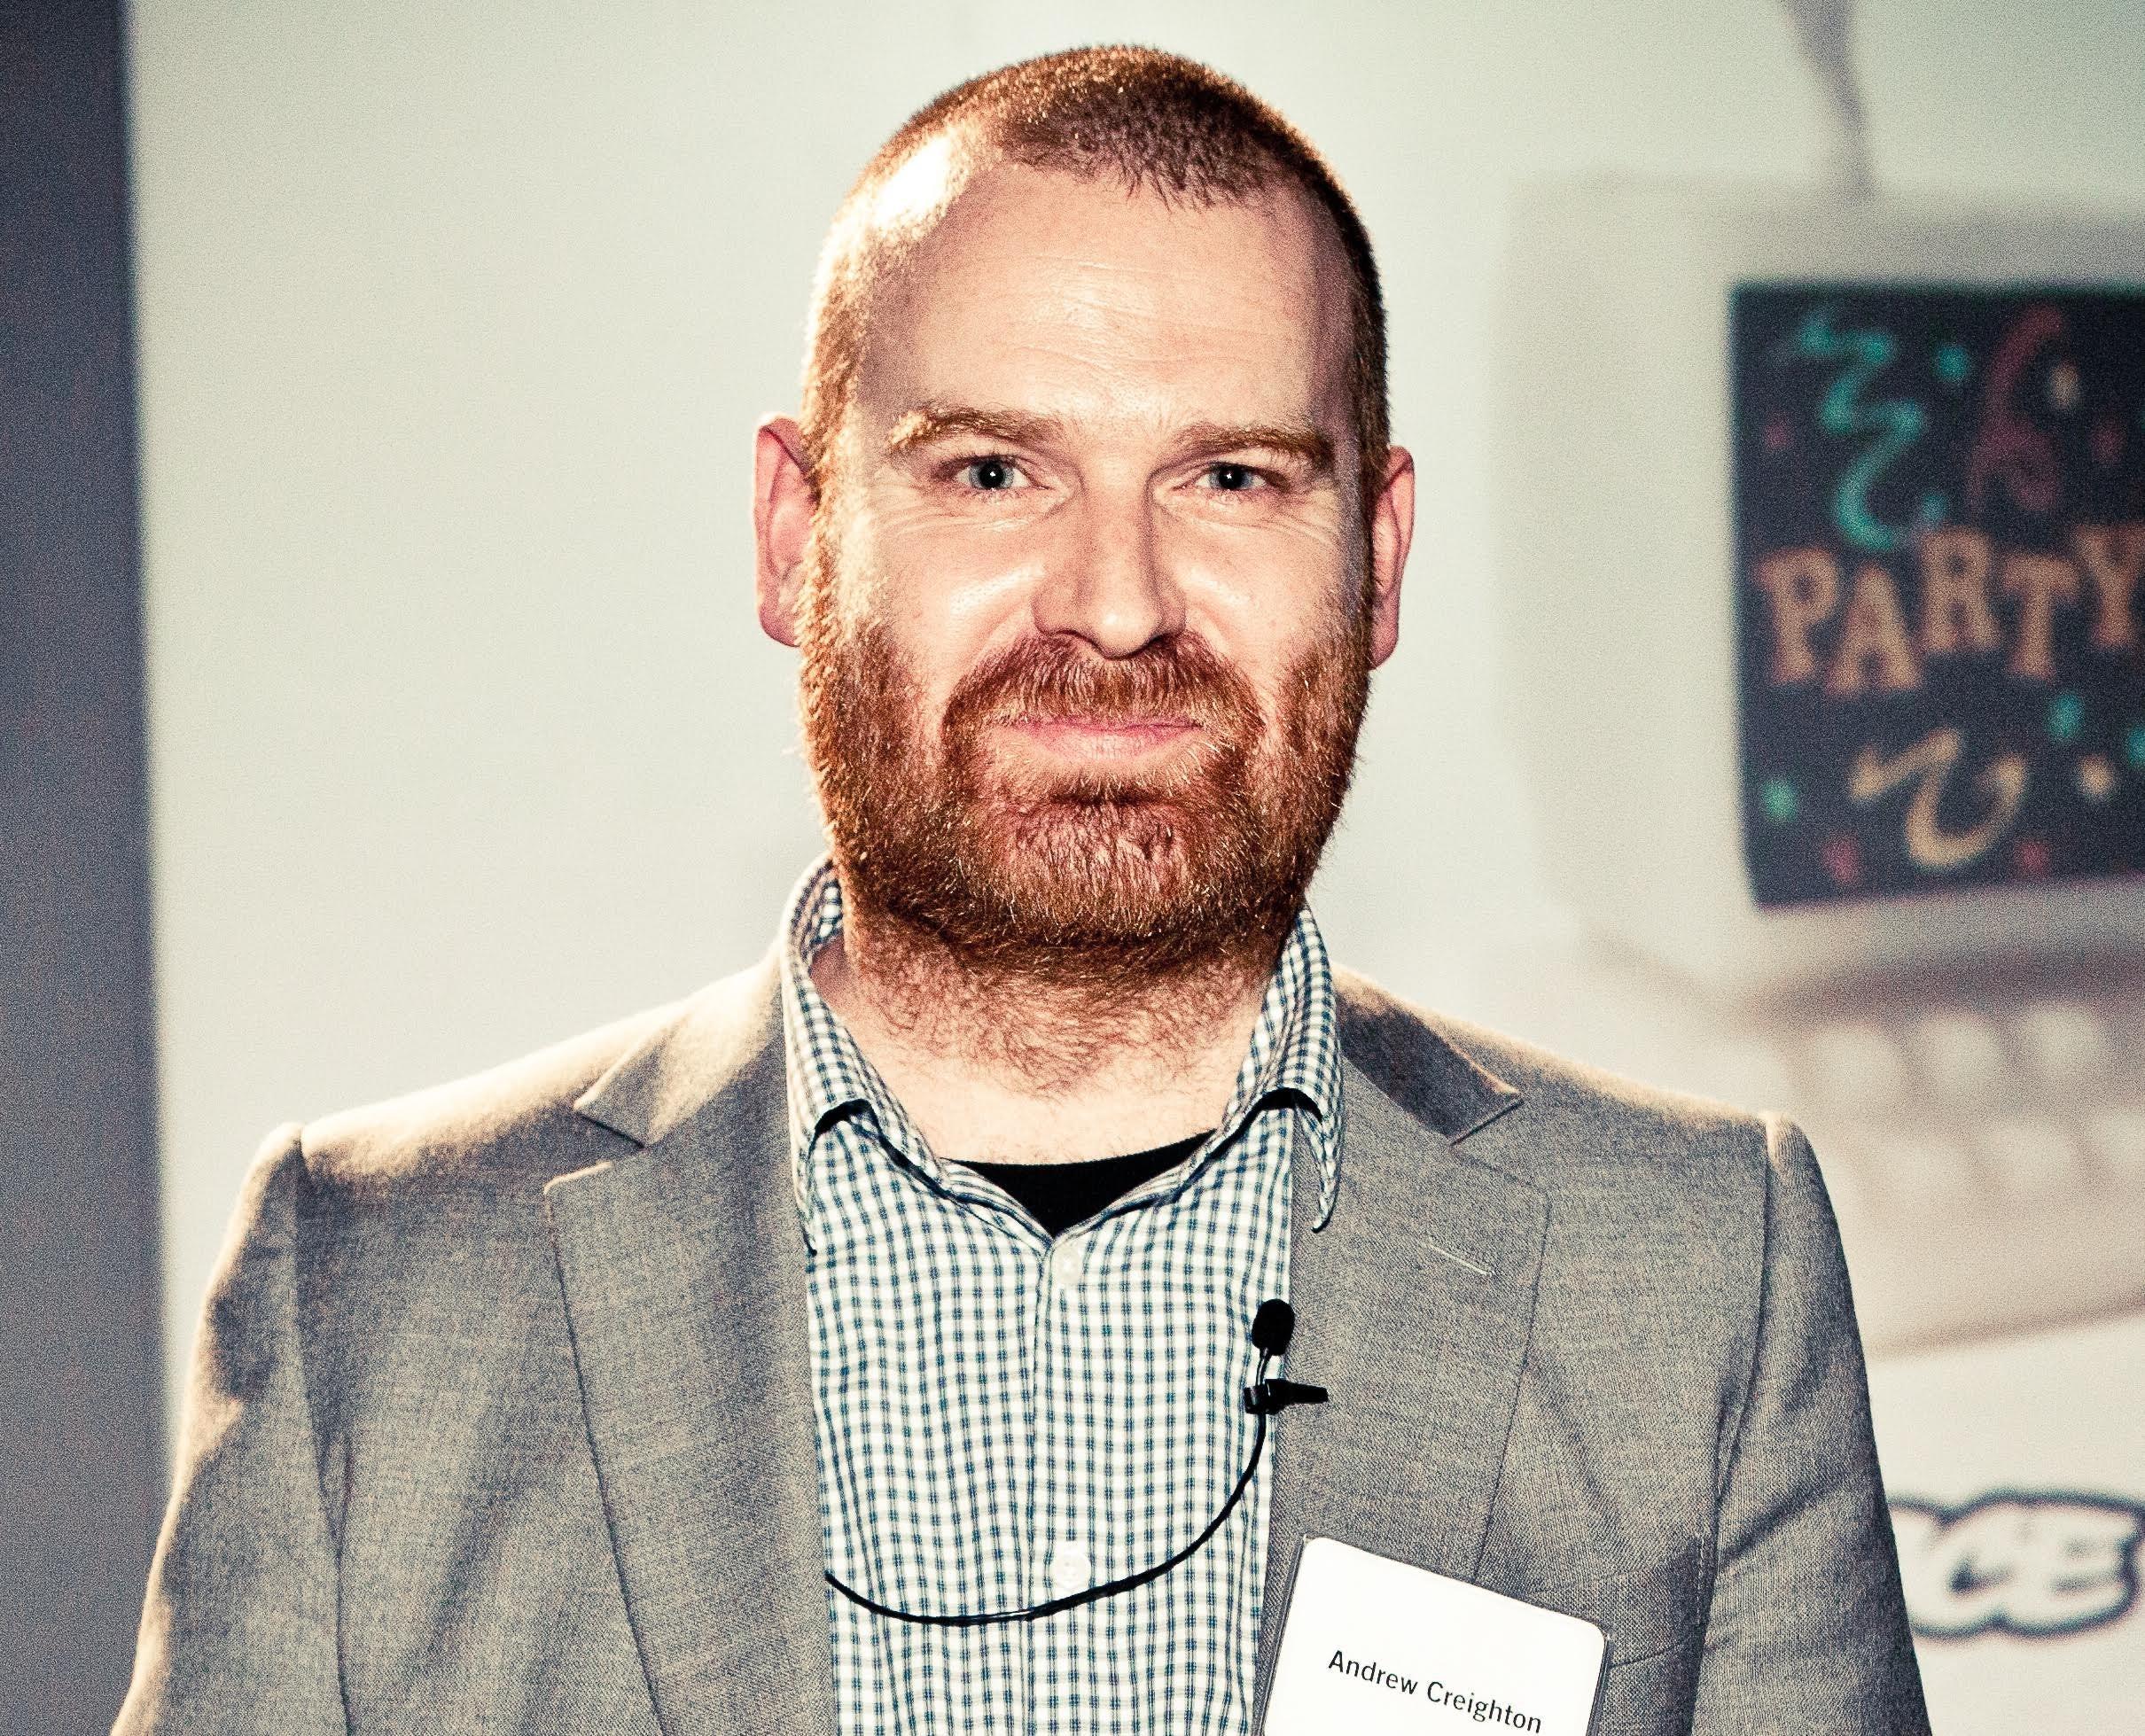 Vice Media president Andrew Creighton | Source: Vice Media